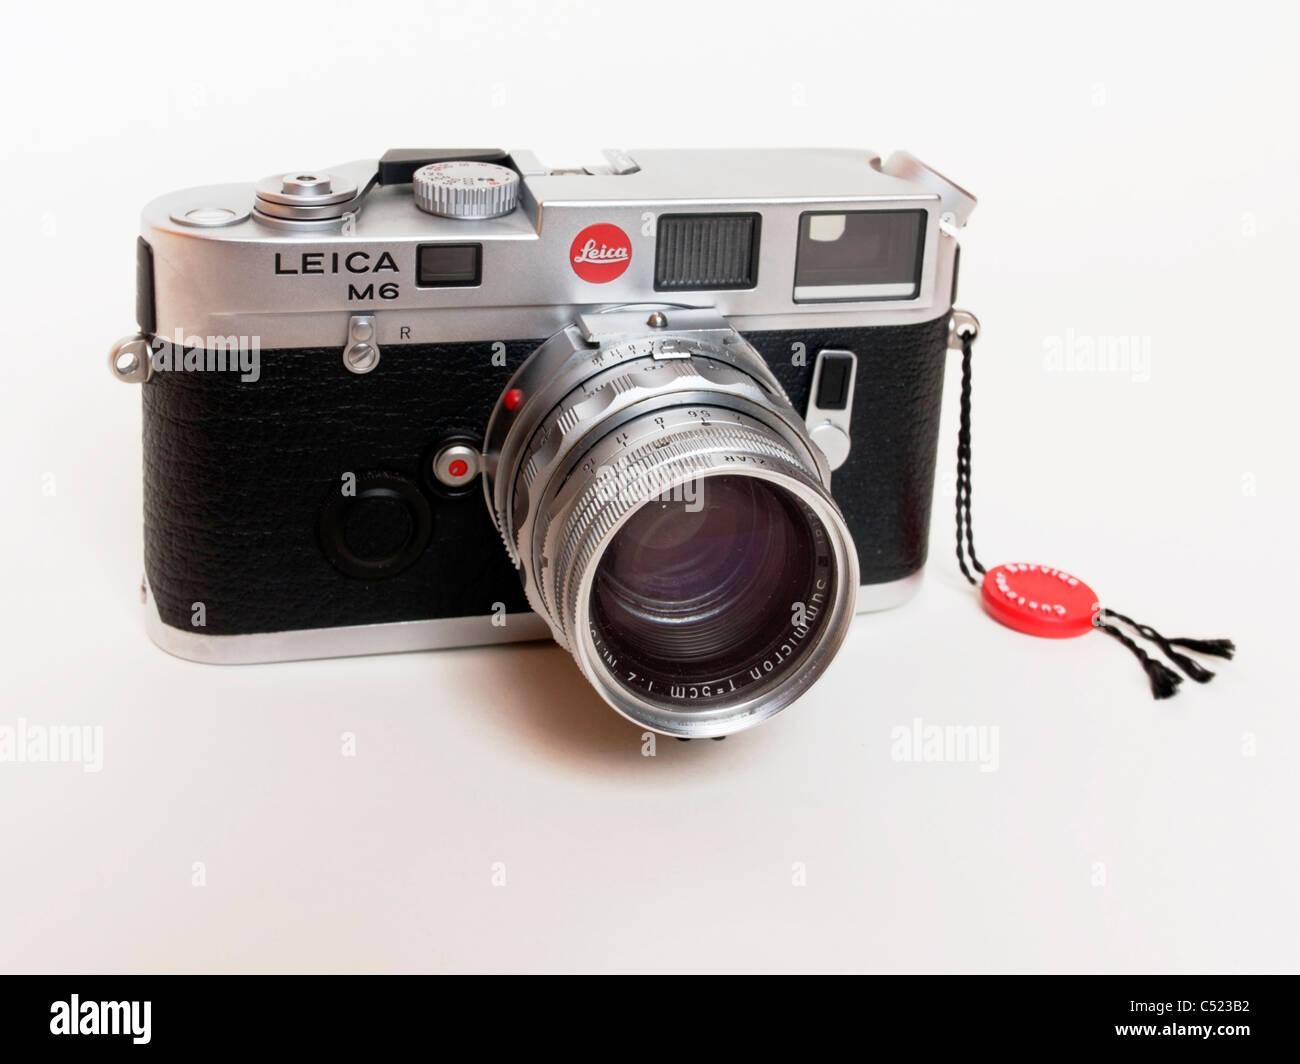 Leica M6 rangefinder camera - Stock Image